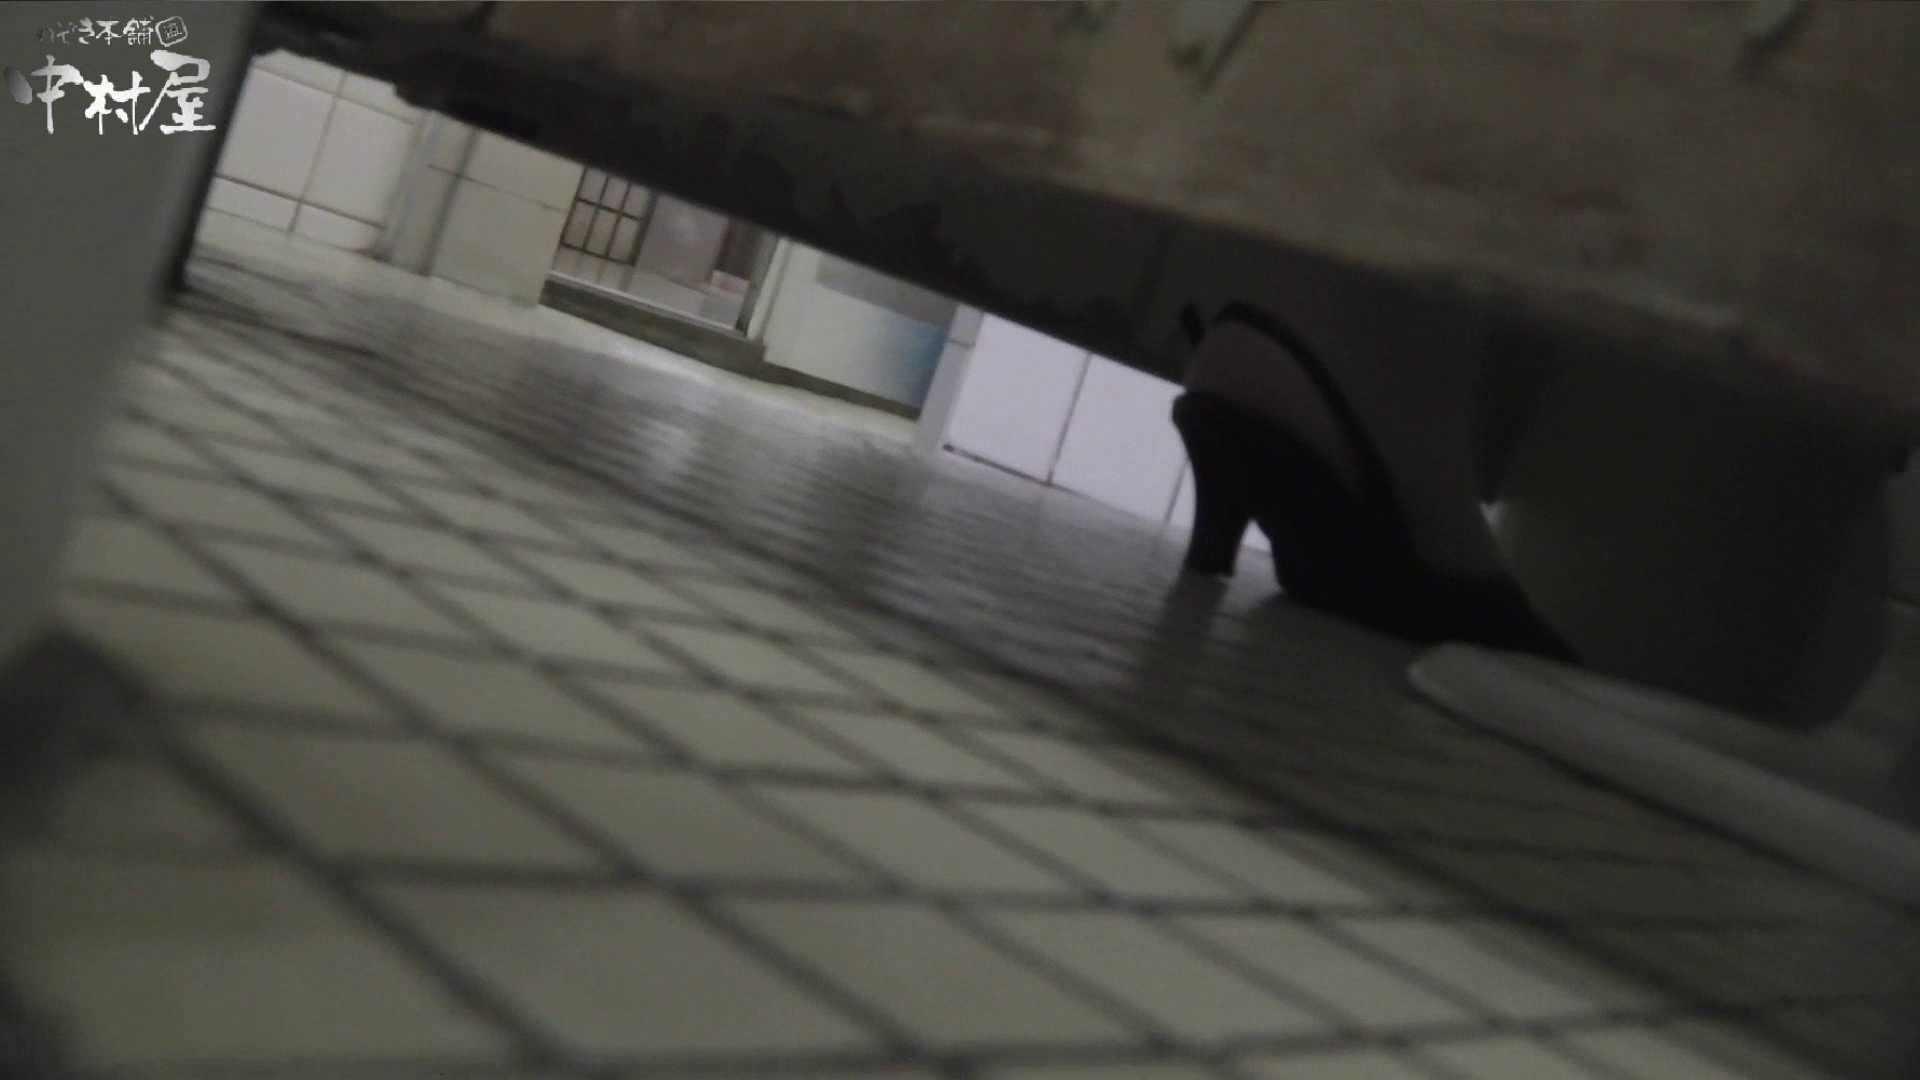 vol.41 命がけ潜伏洗面所! 毛薄め・硬度並・推定250g 洗面所突入 | プライベート  93pic 13